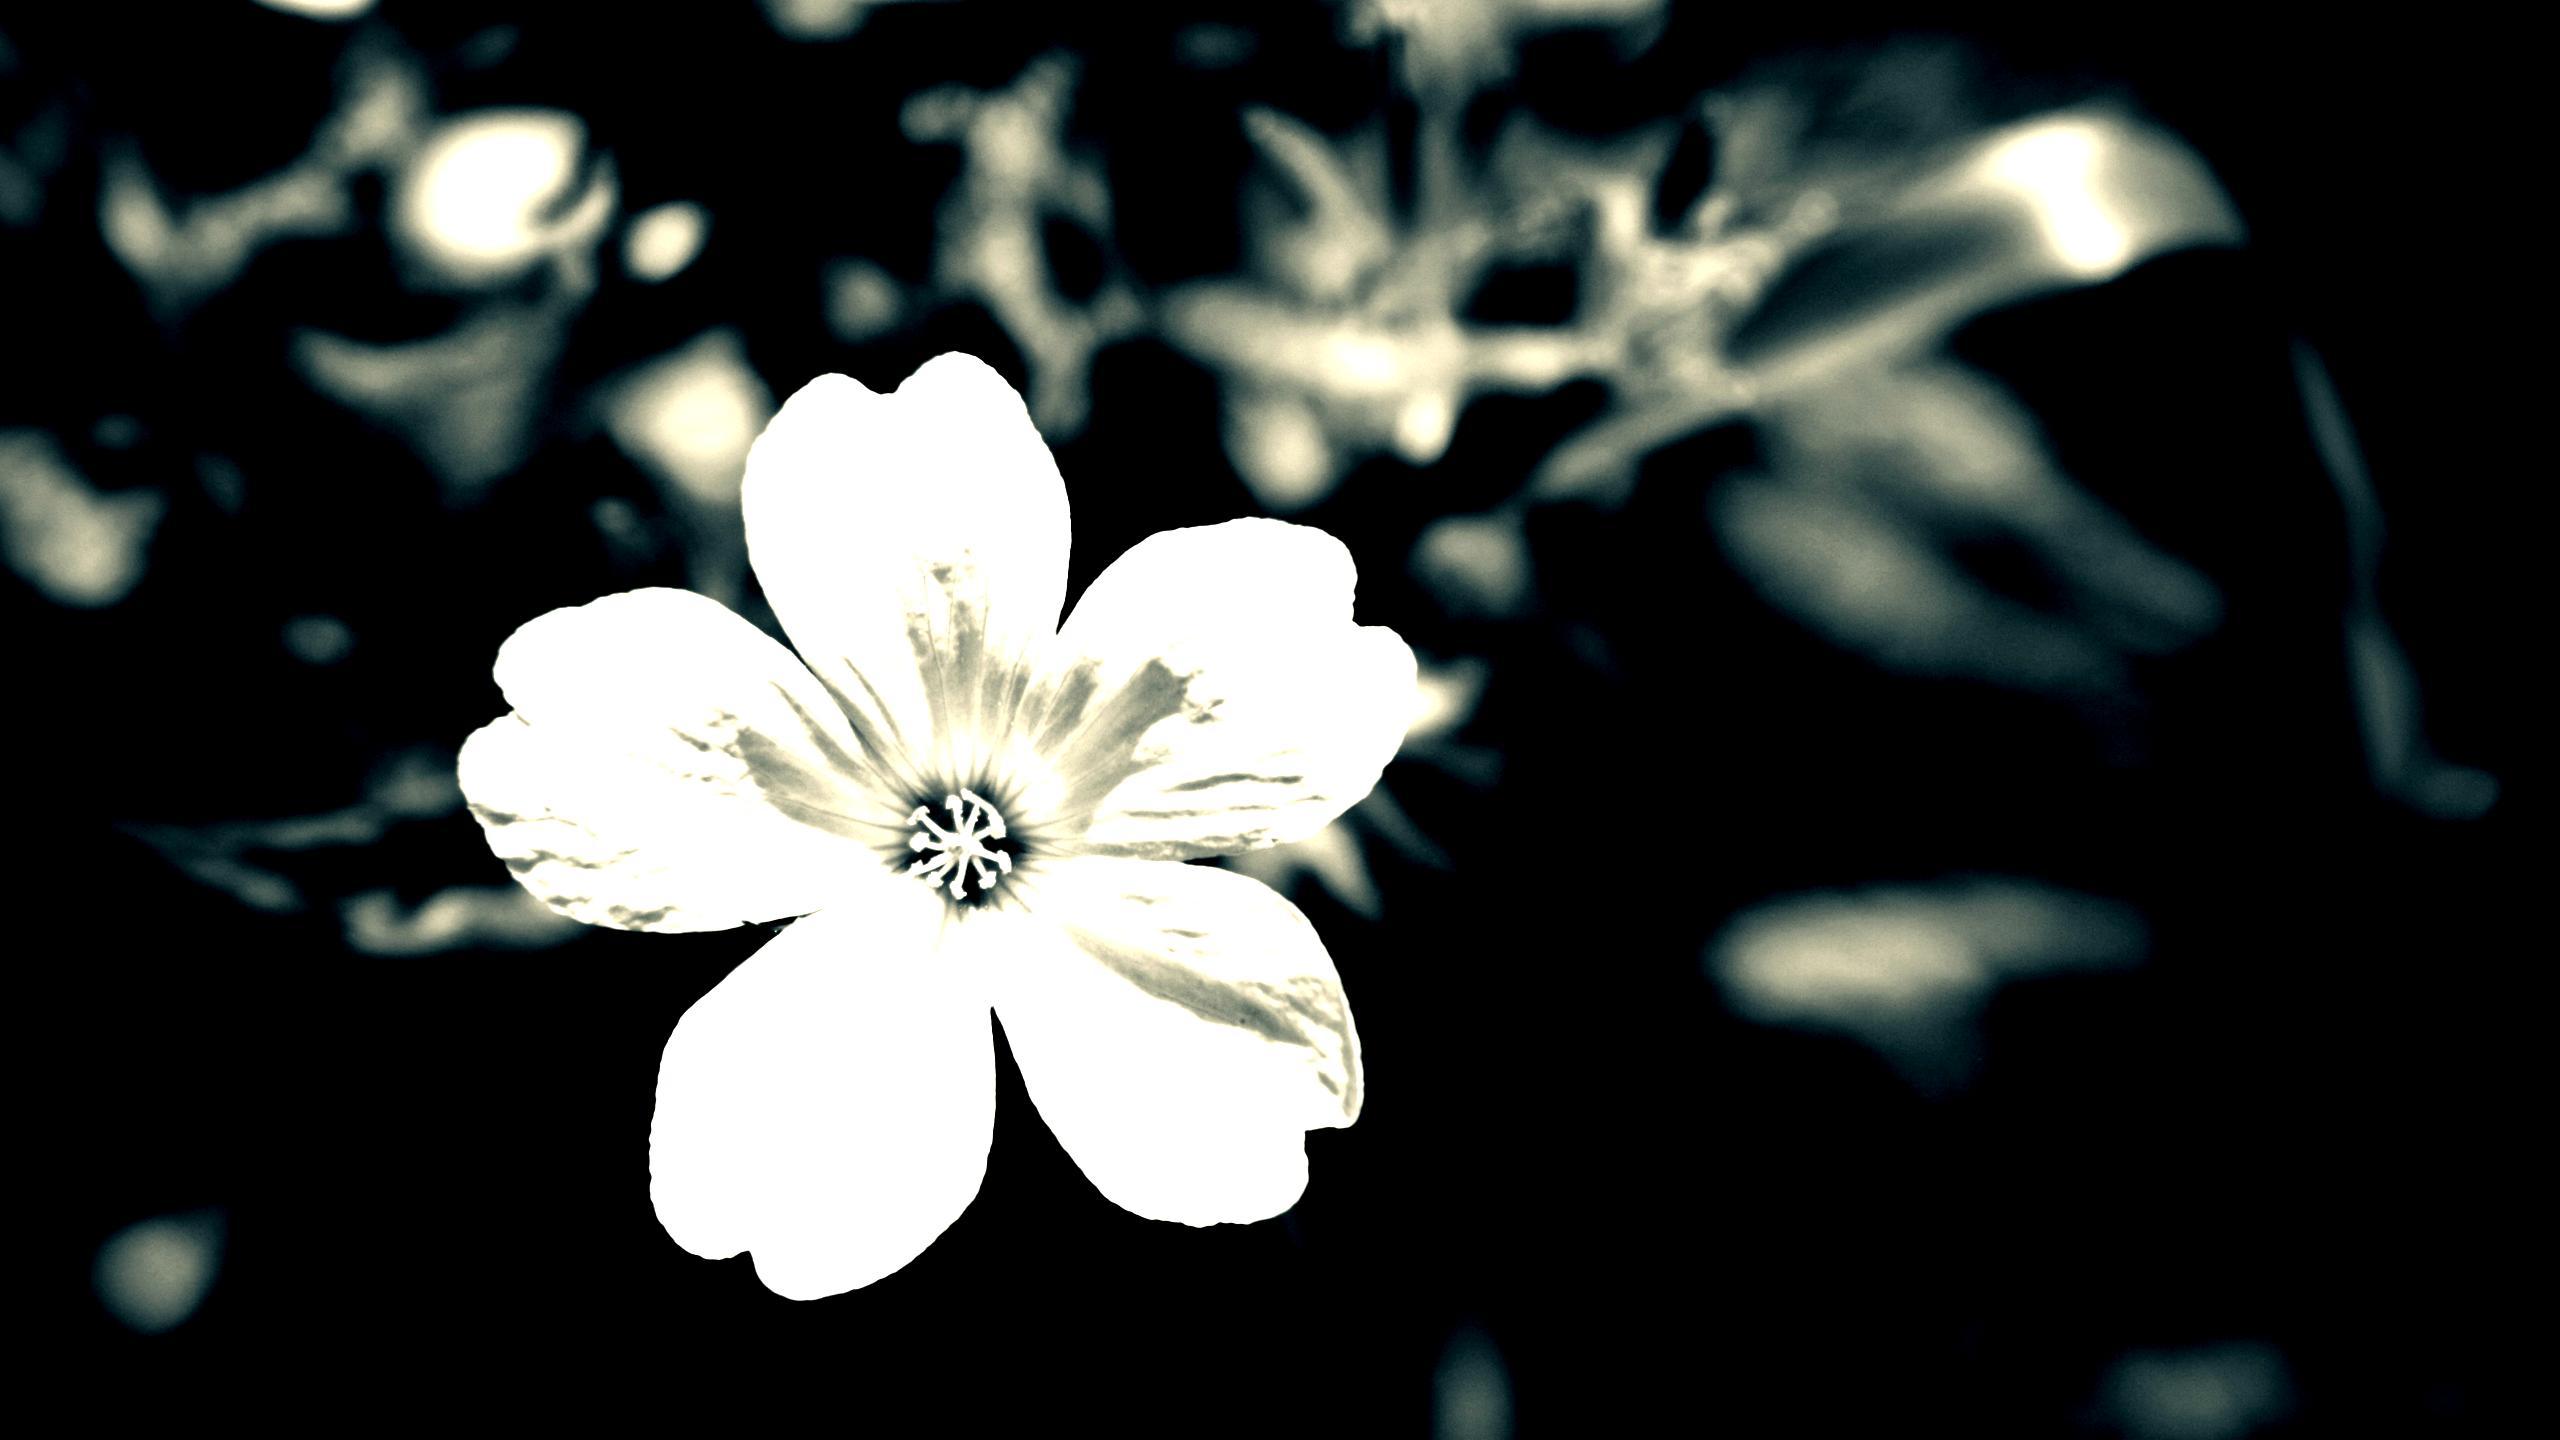 Gray and white flower wallpaper 5 background hdflowerwallpaper gray and white flower wallpaper free wallpaper mightylinksfo